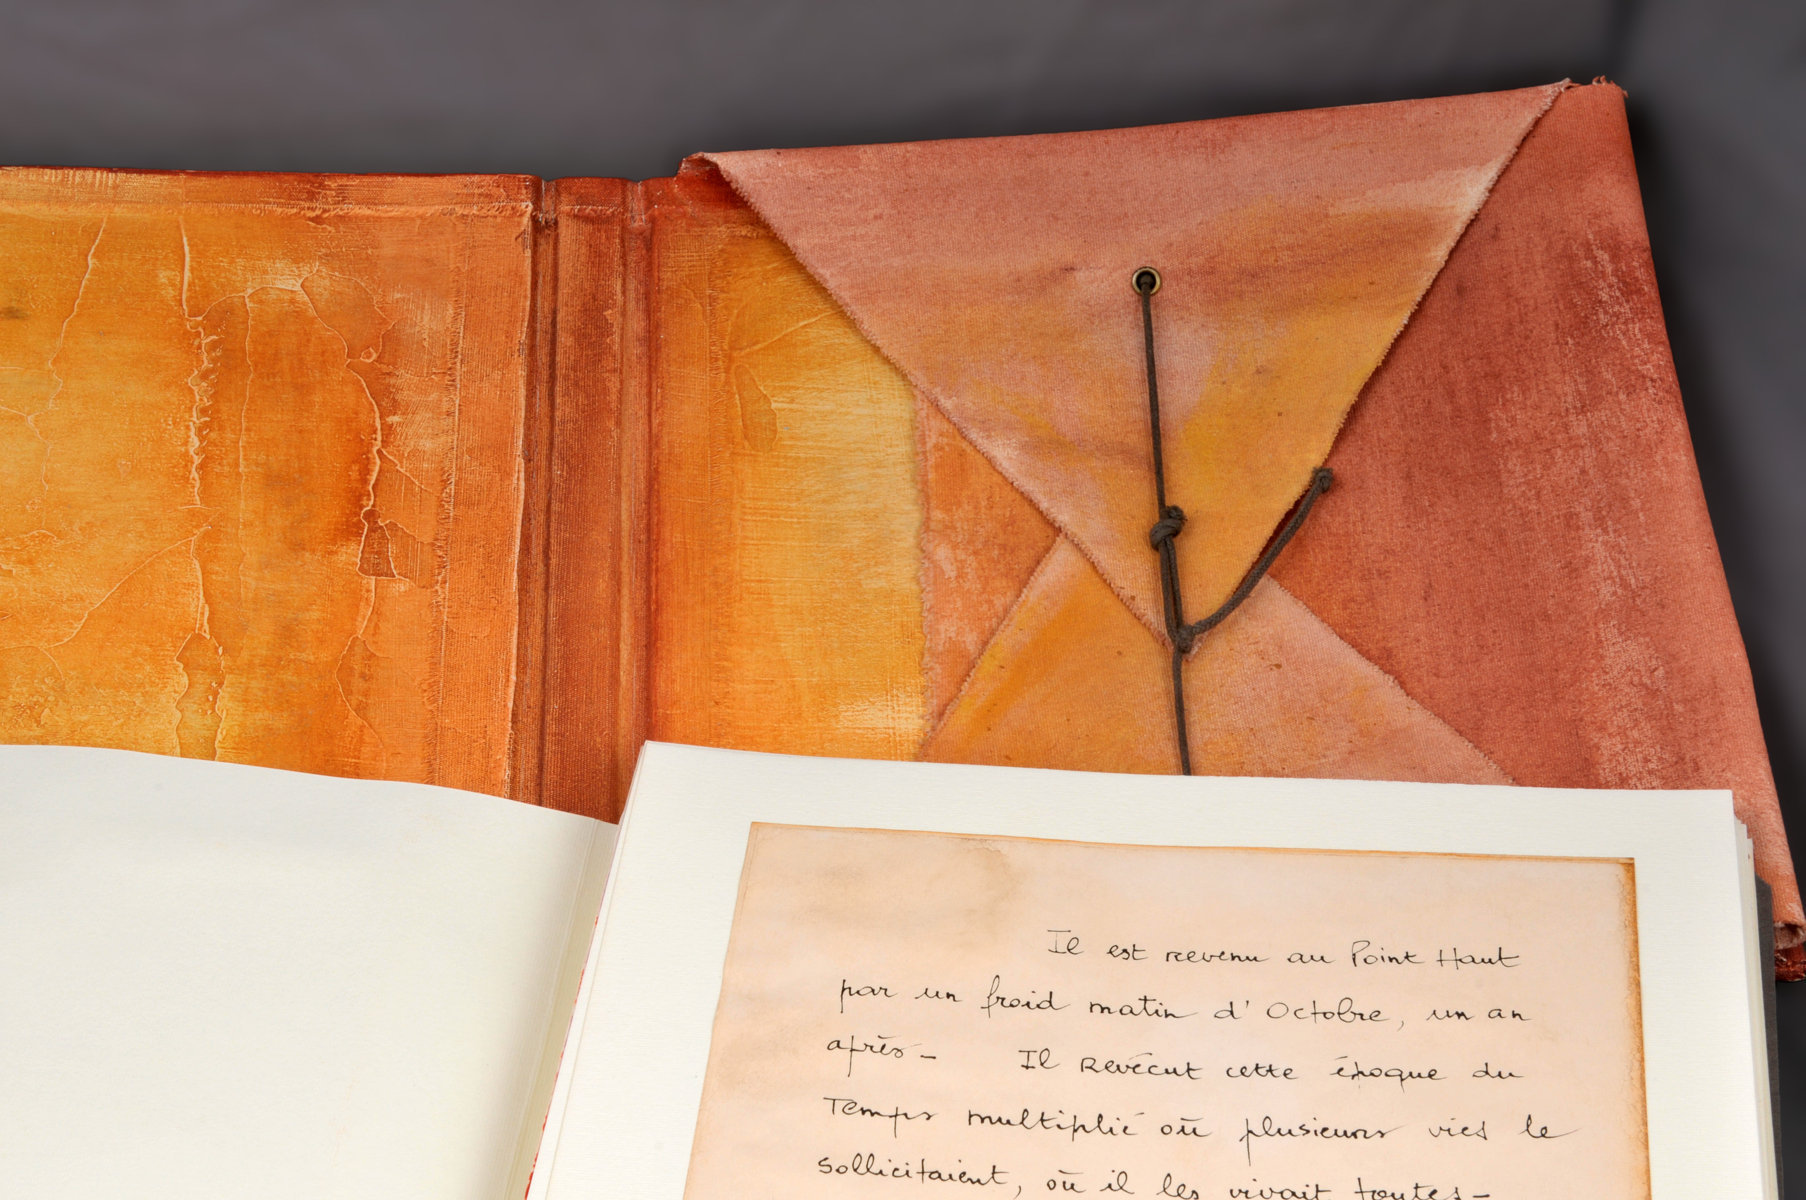 Dernier comptoir avant la neige | Schmitt, Daniel (1929-....). Auteur